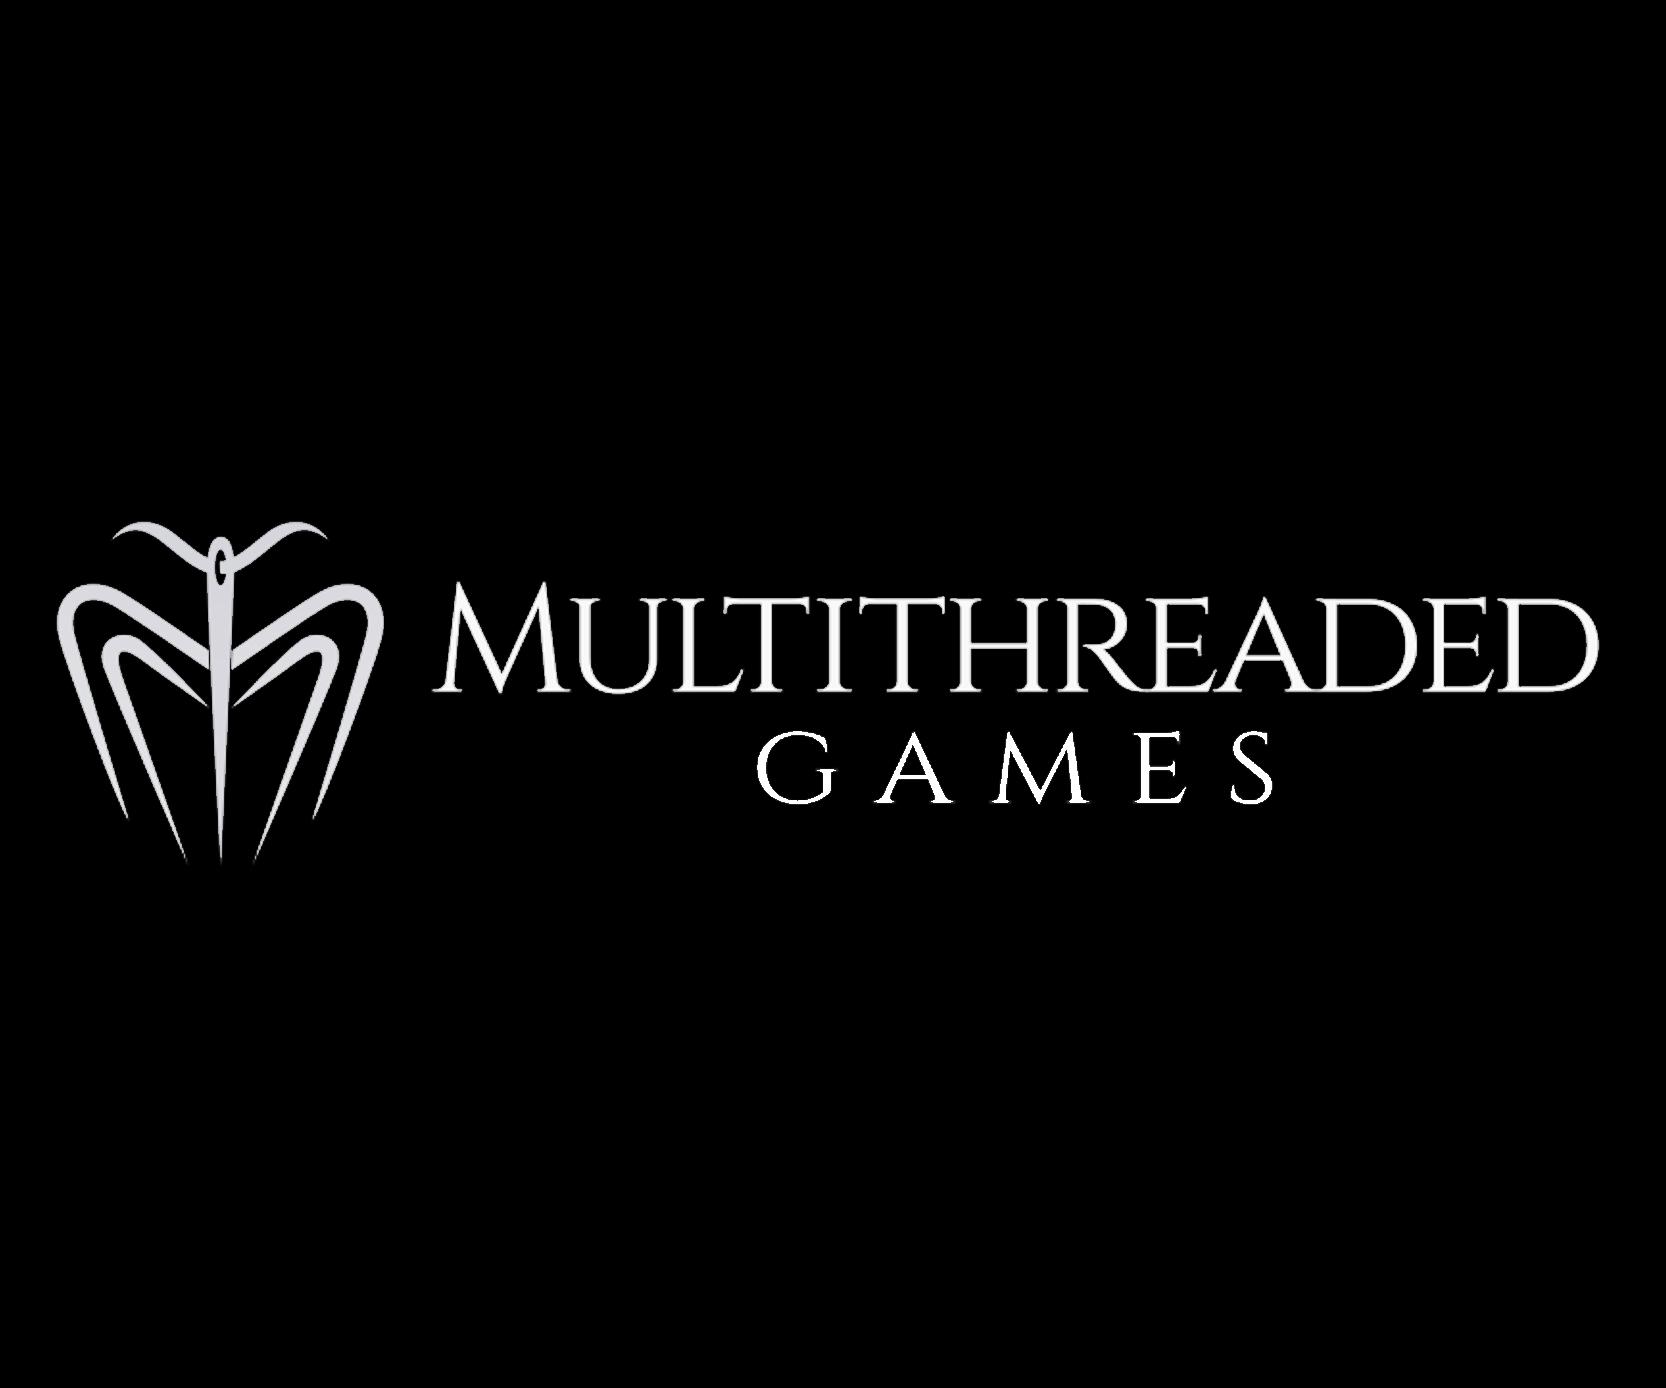 MultithreadedGames_Horizontal_Inverted_Alpha.png